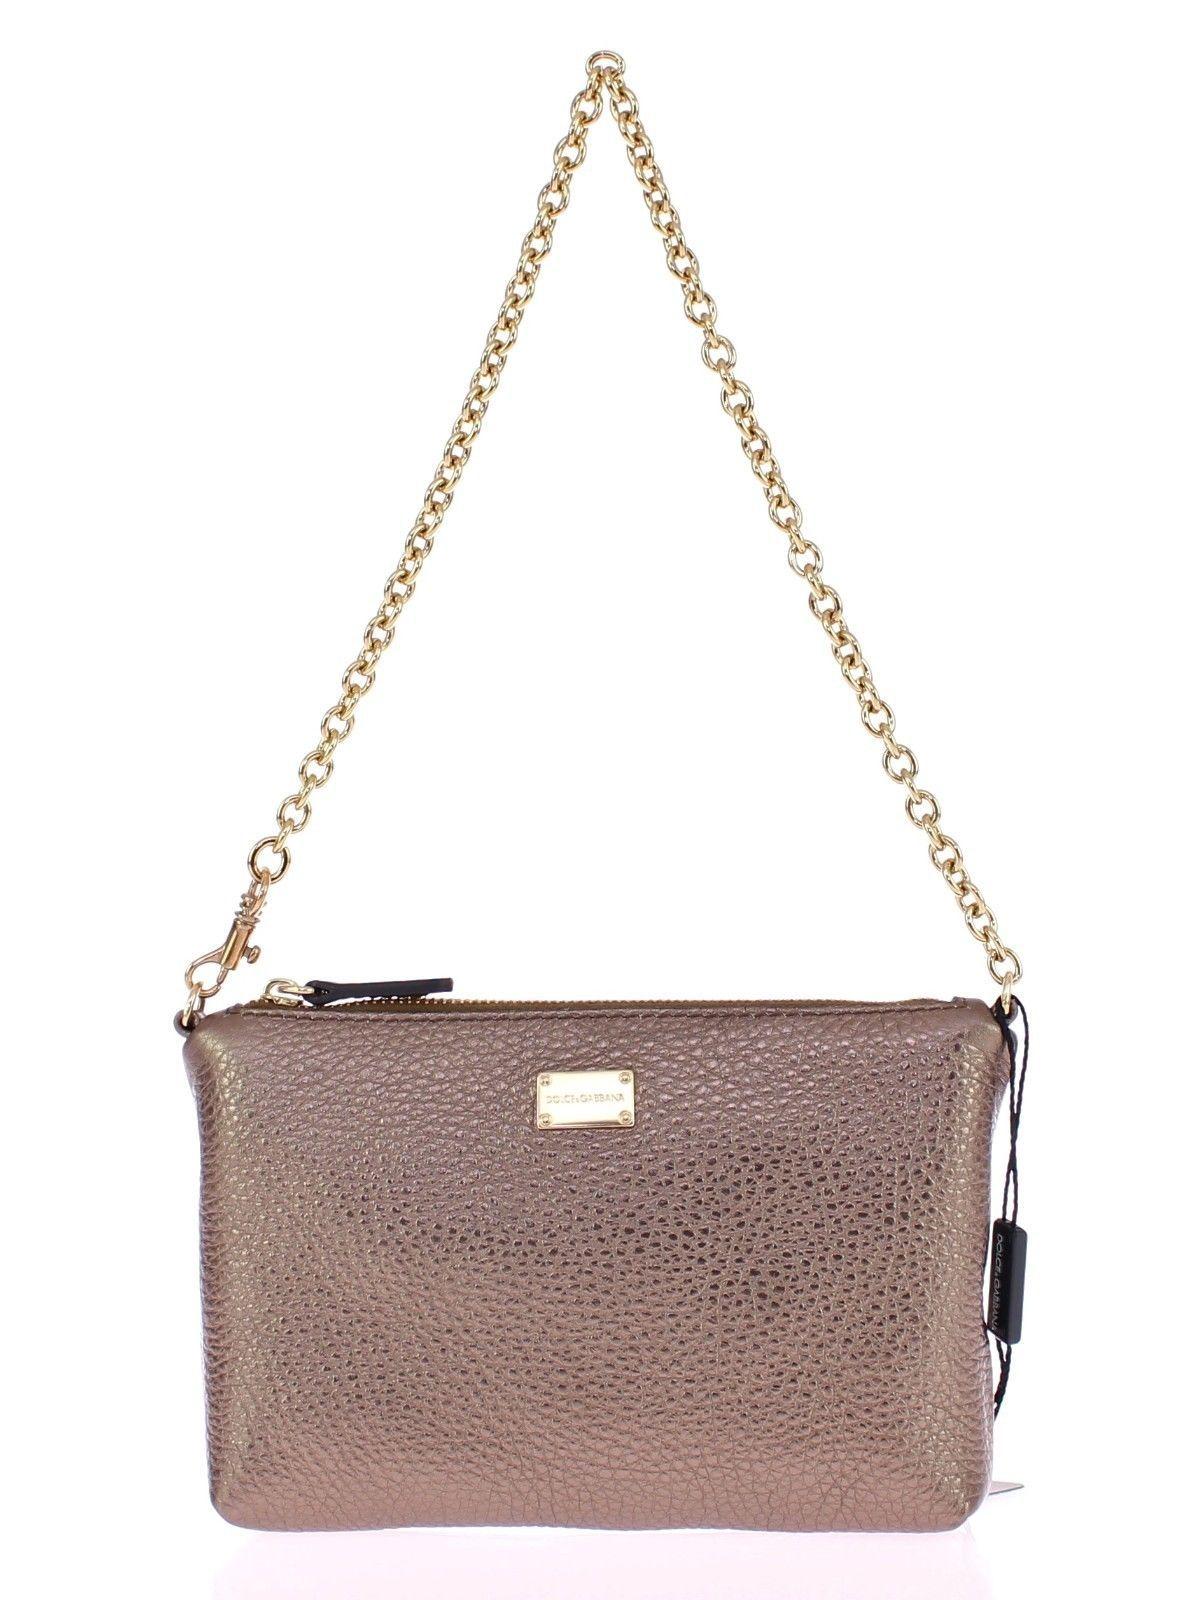 $630 Dolce Gabbana Bronze Metallic Leather Miss Glam Shoulder Clutch Bag | eBay